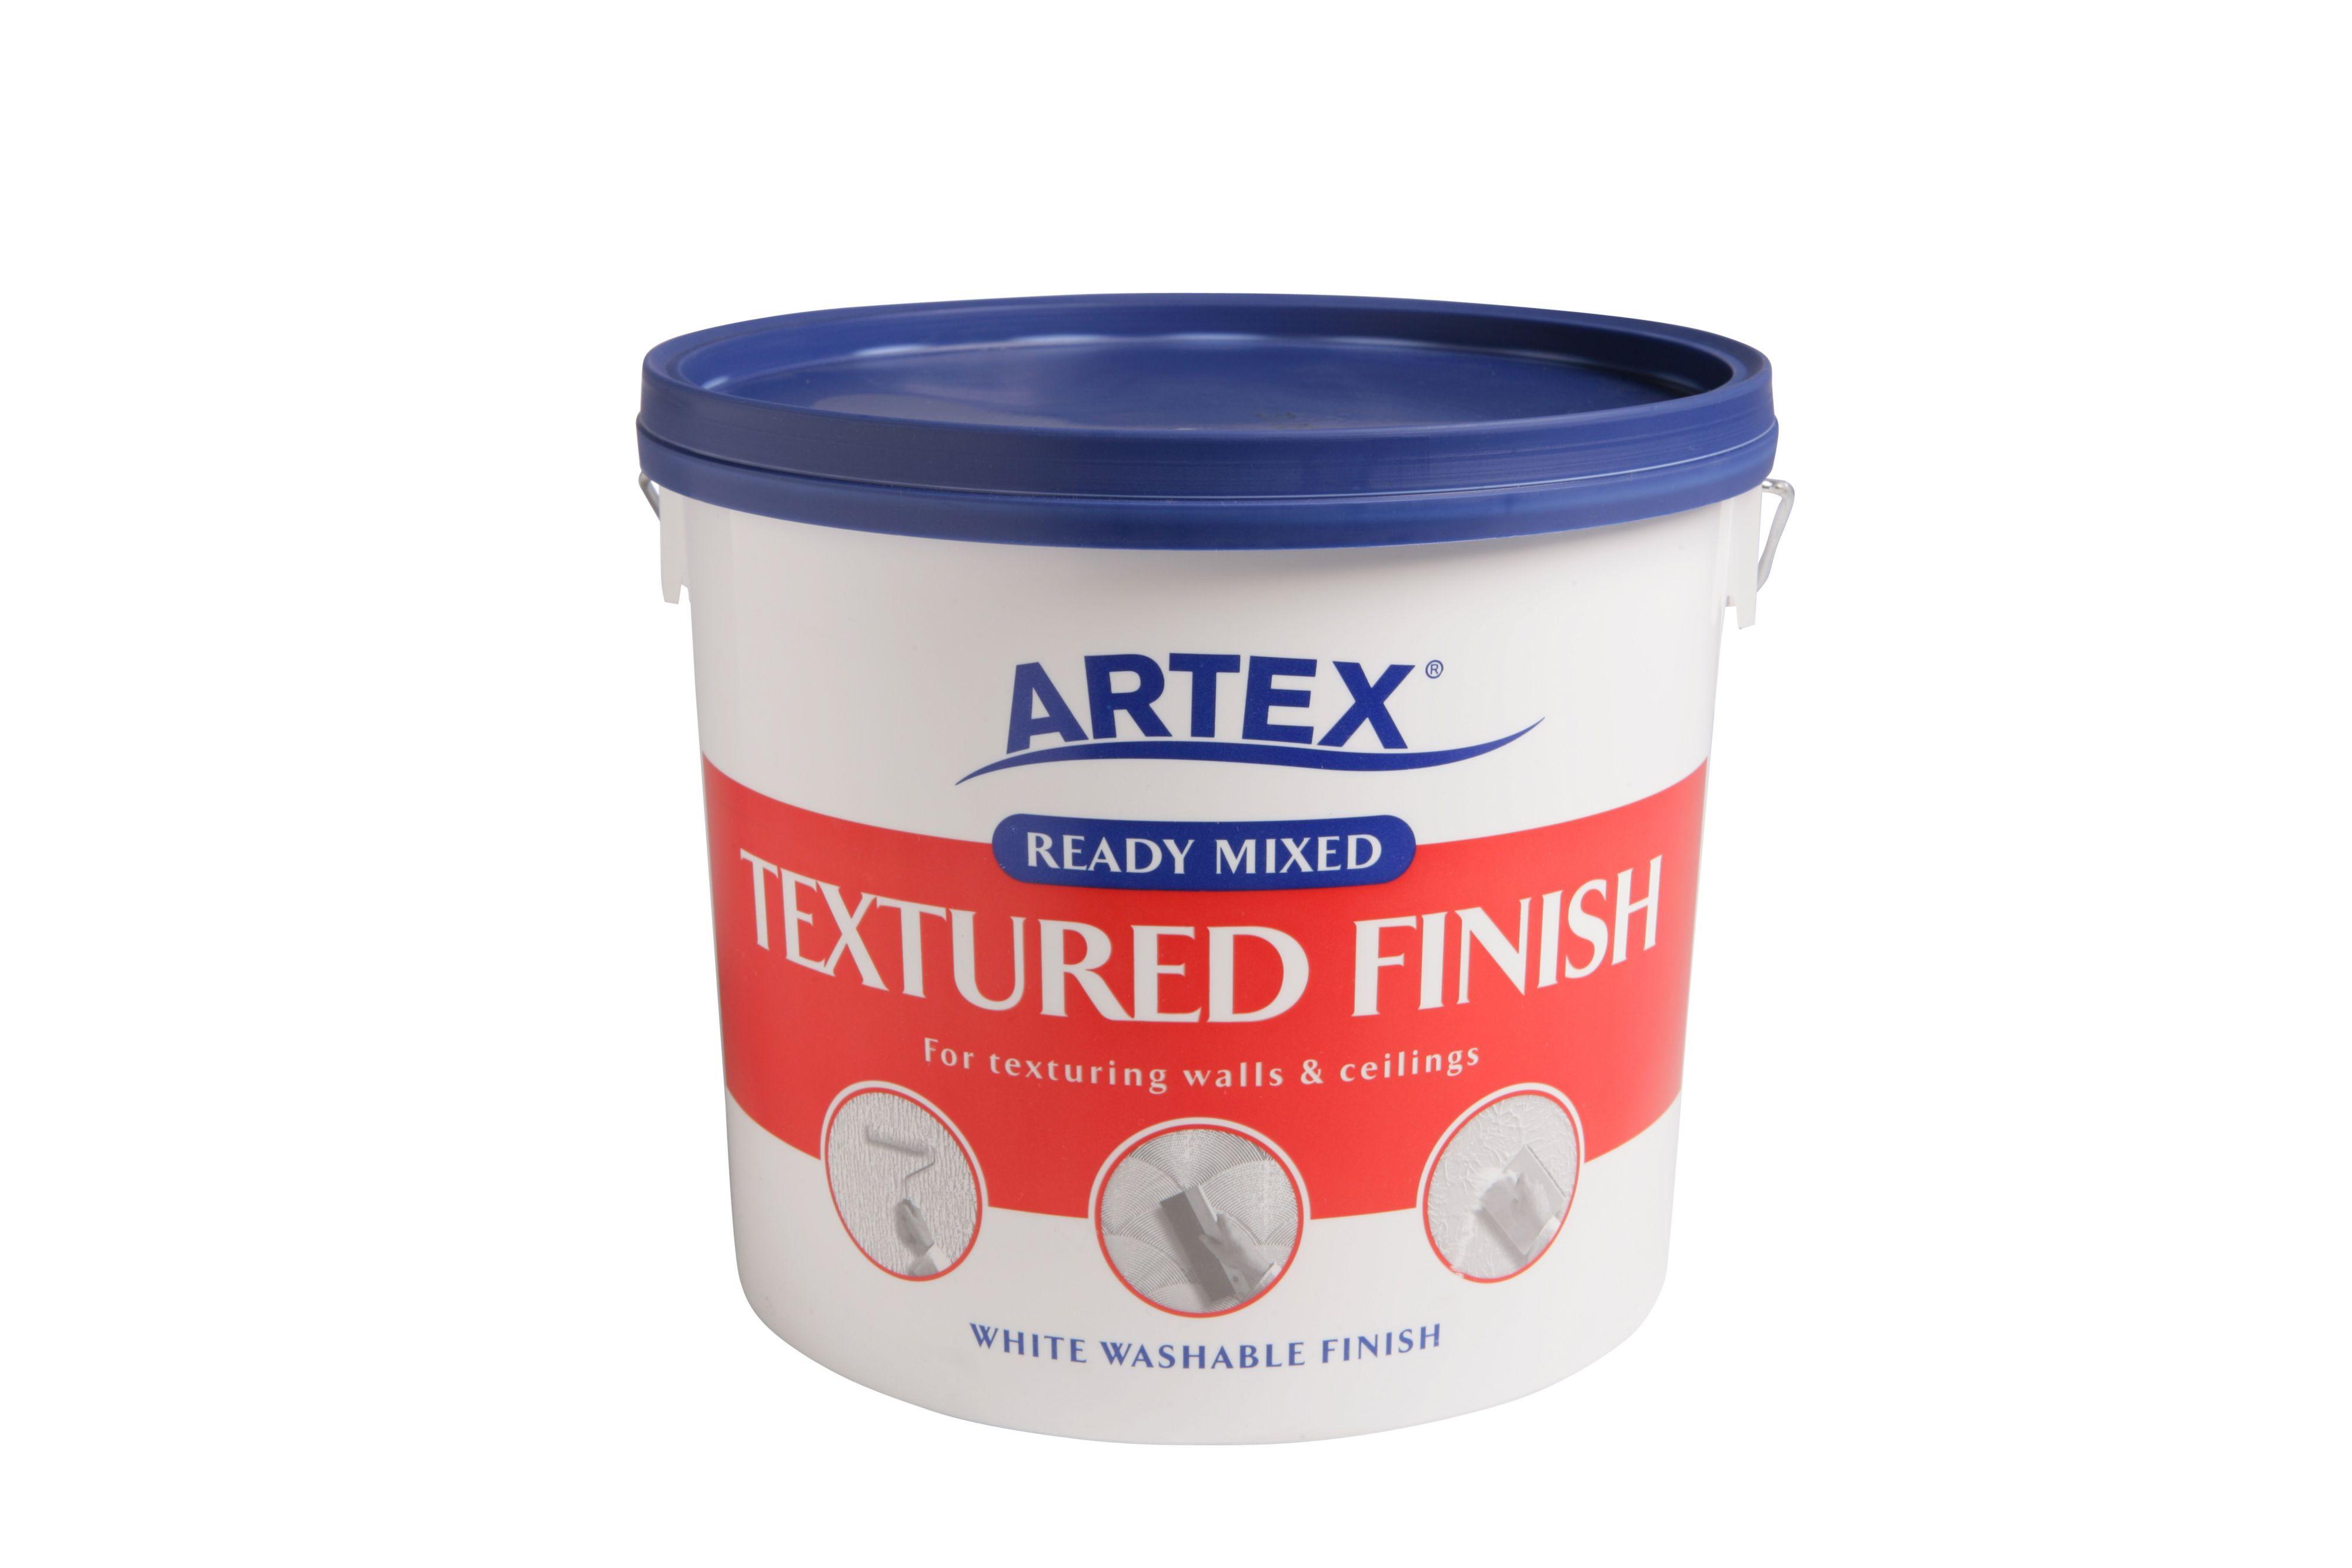 Artex Ready Mixed Textured Finish Coating Departments